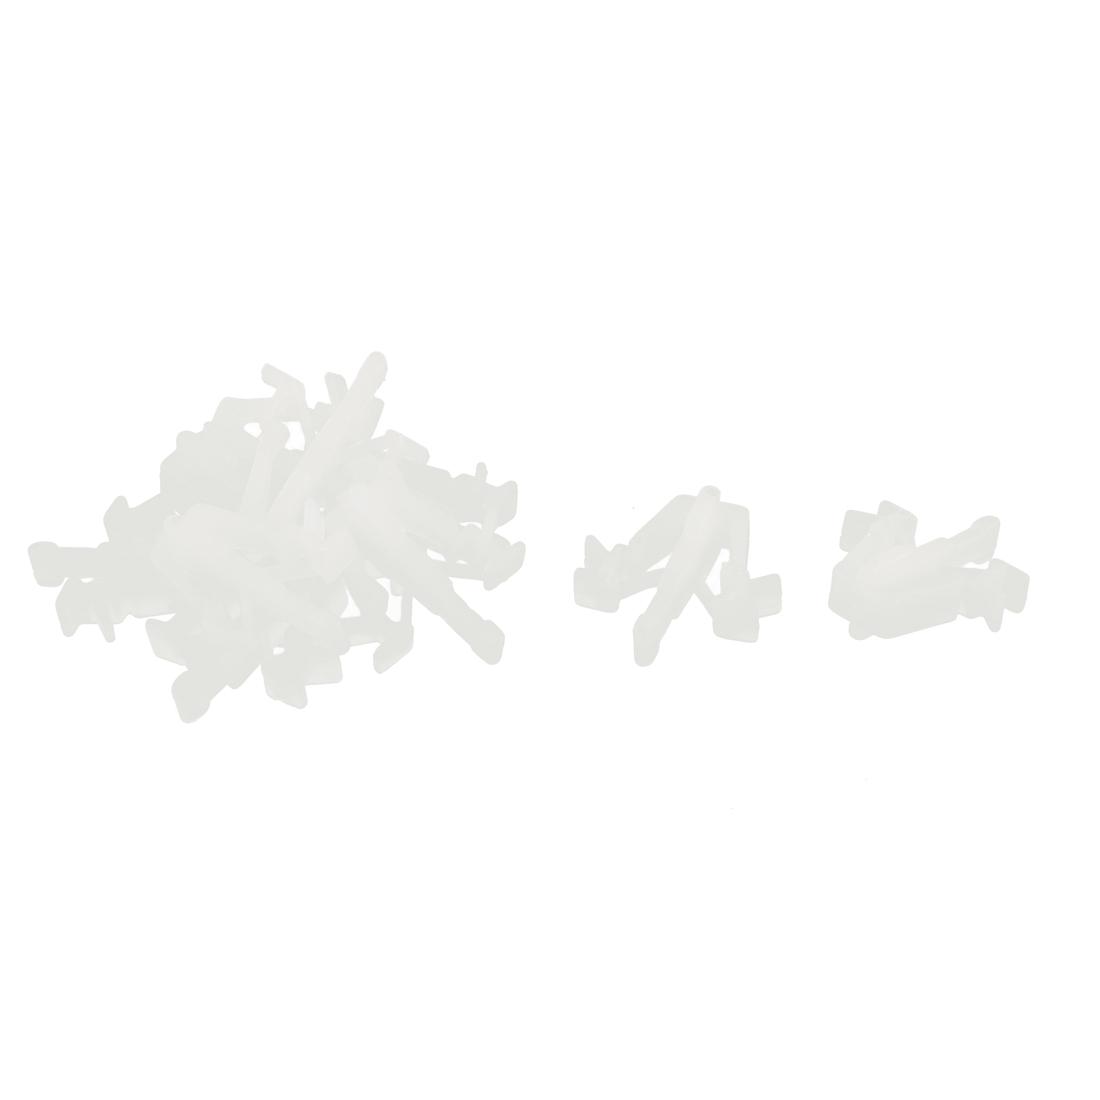 10 Pcs Beige Plastic Splash Defender Fastener Clip for Pickup